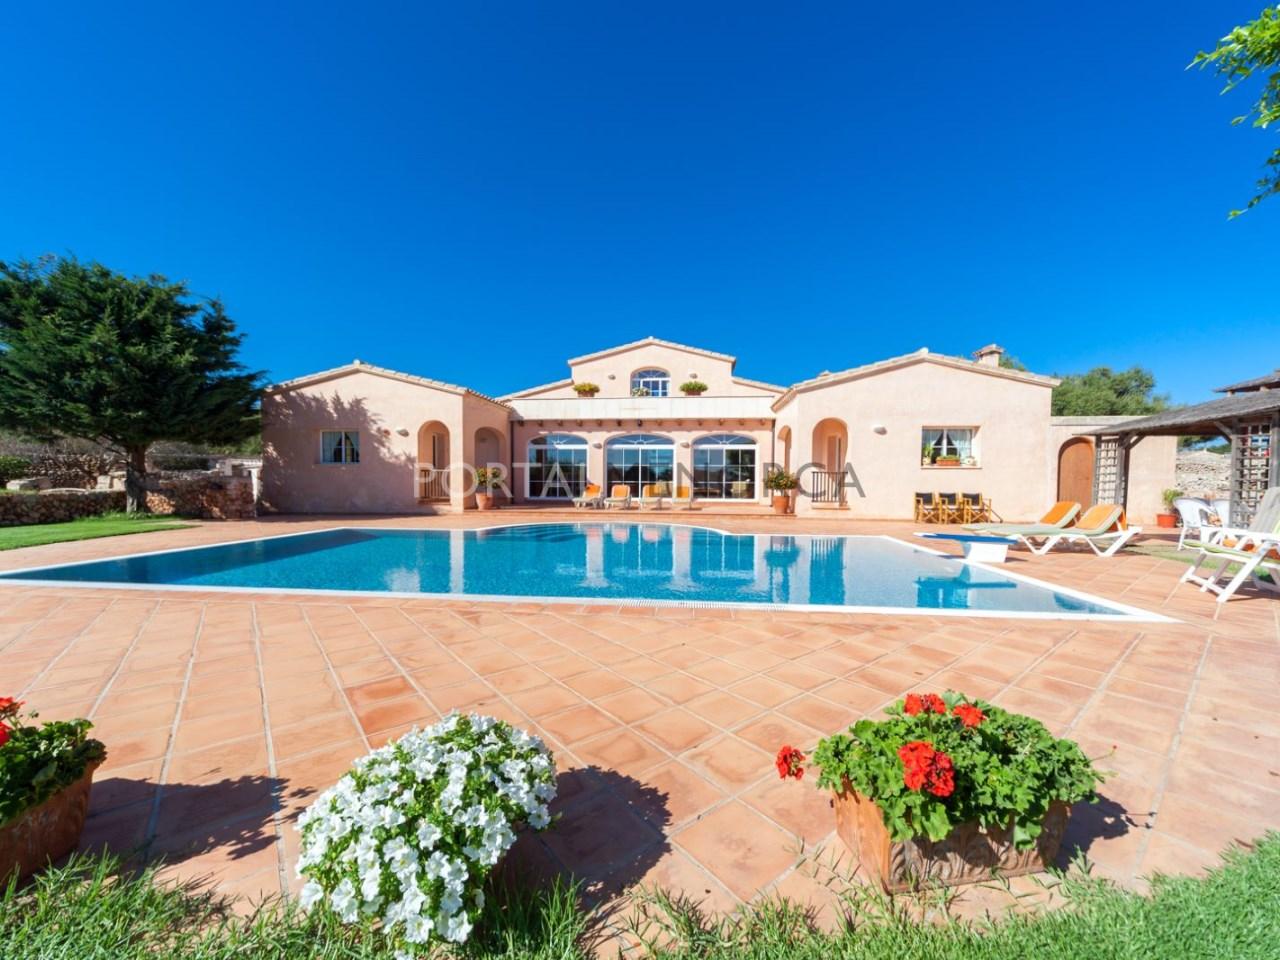 Casa de campo con piscina en Menorca (6 de 41)